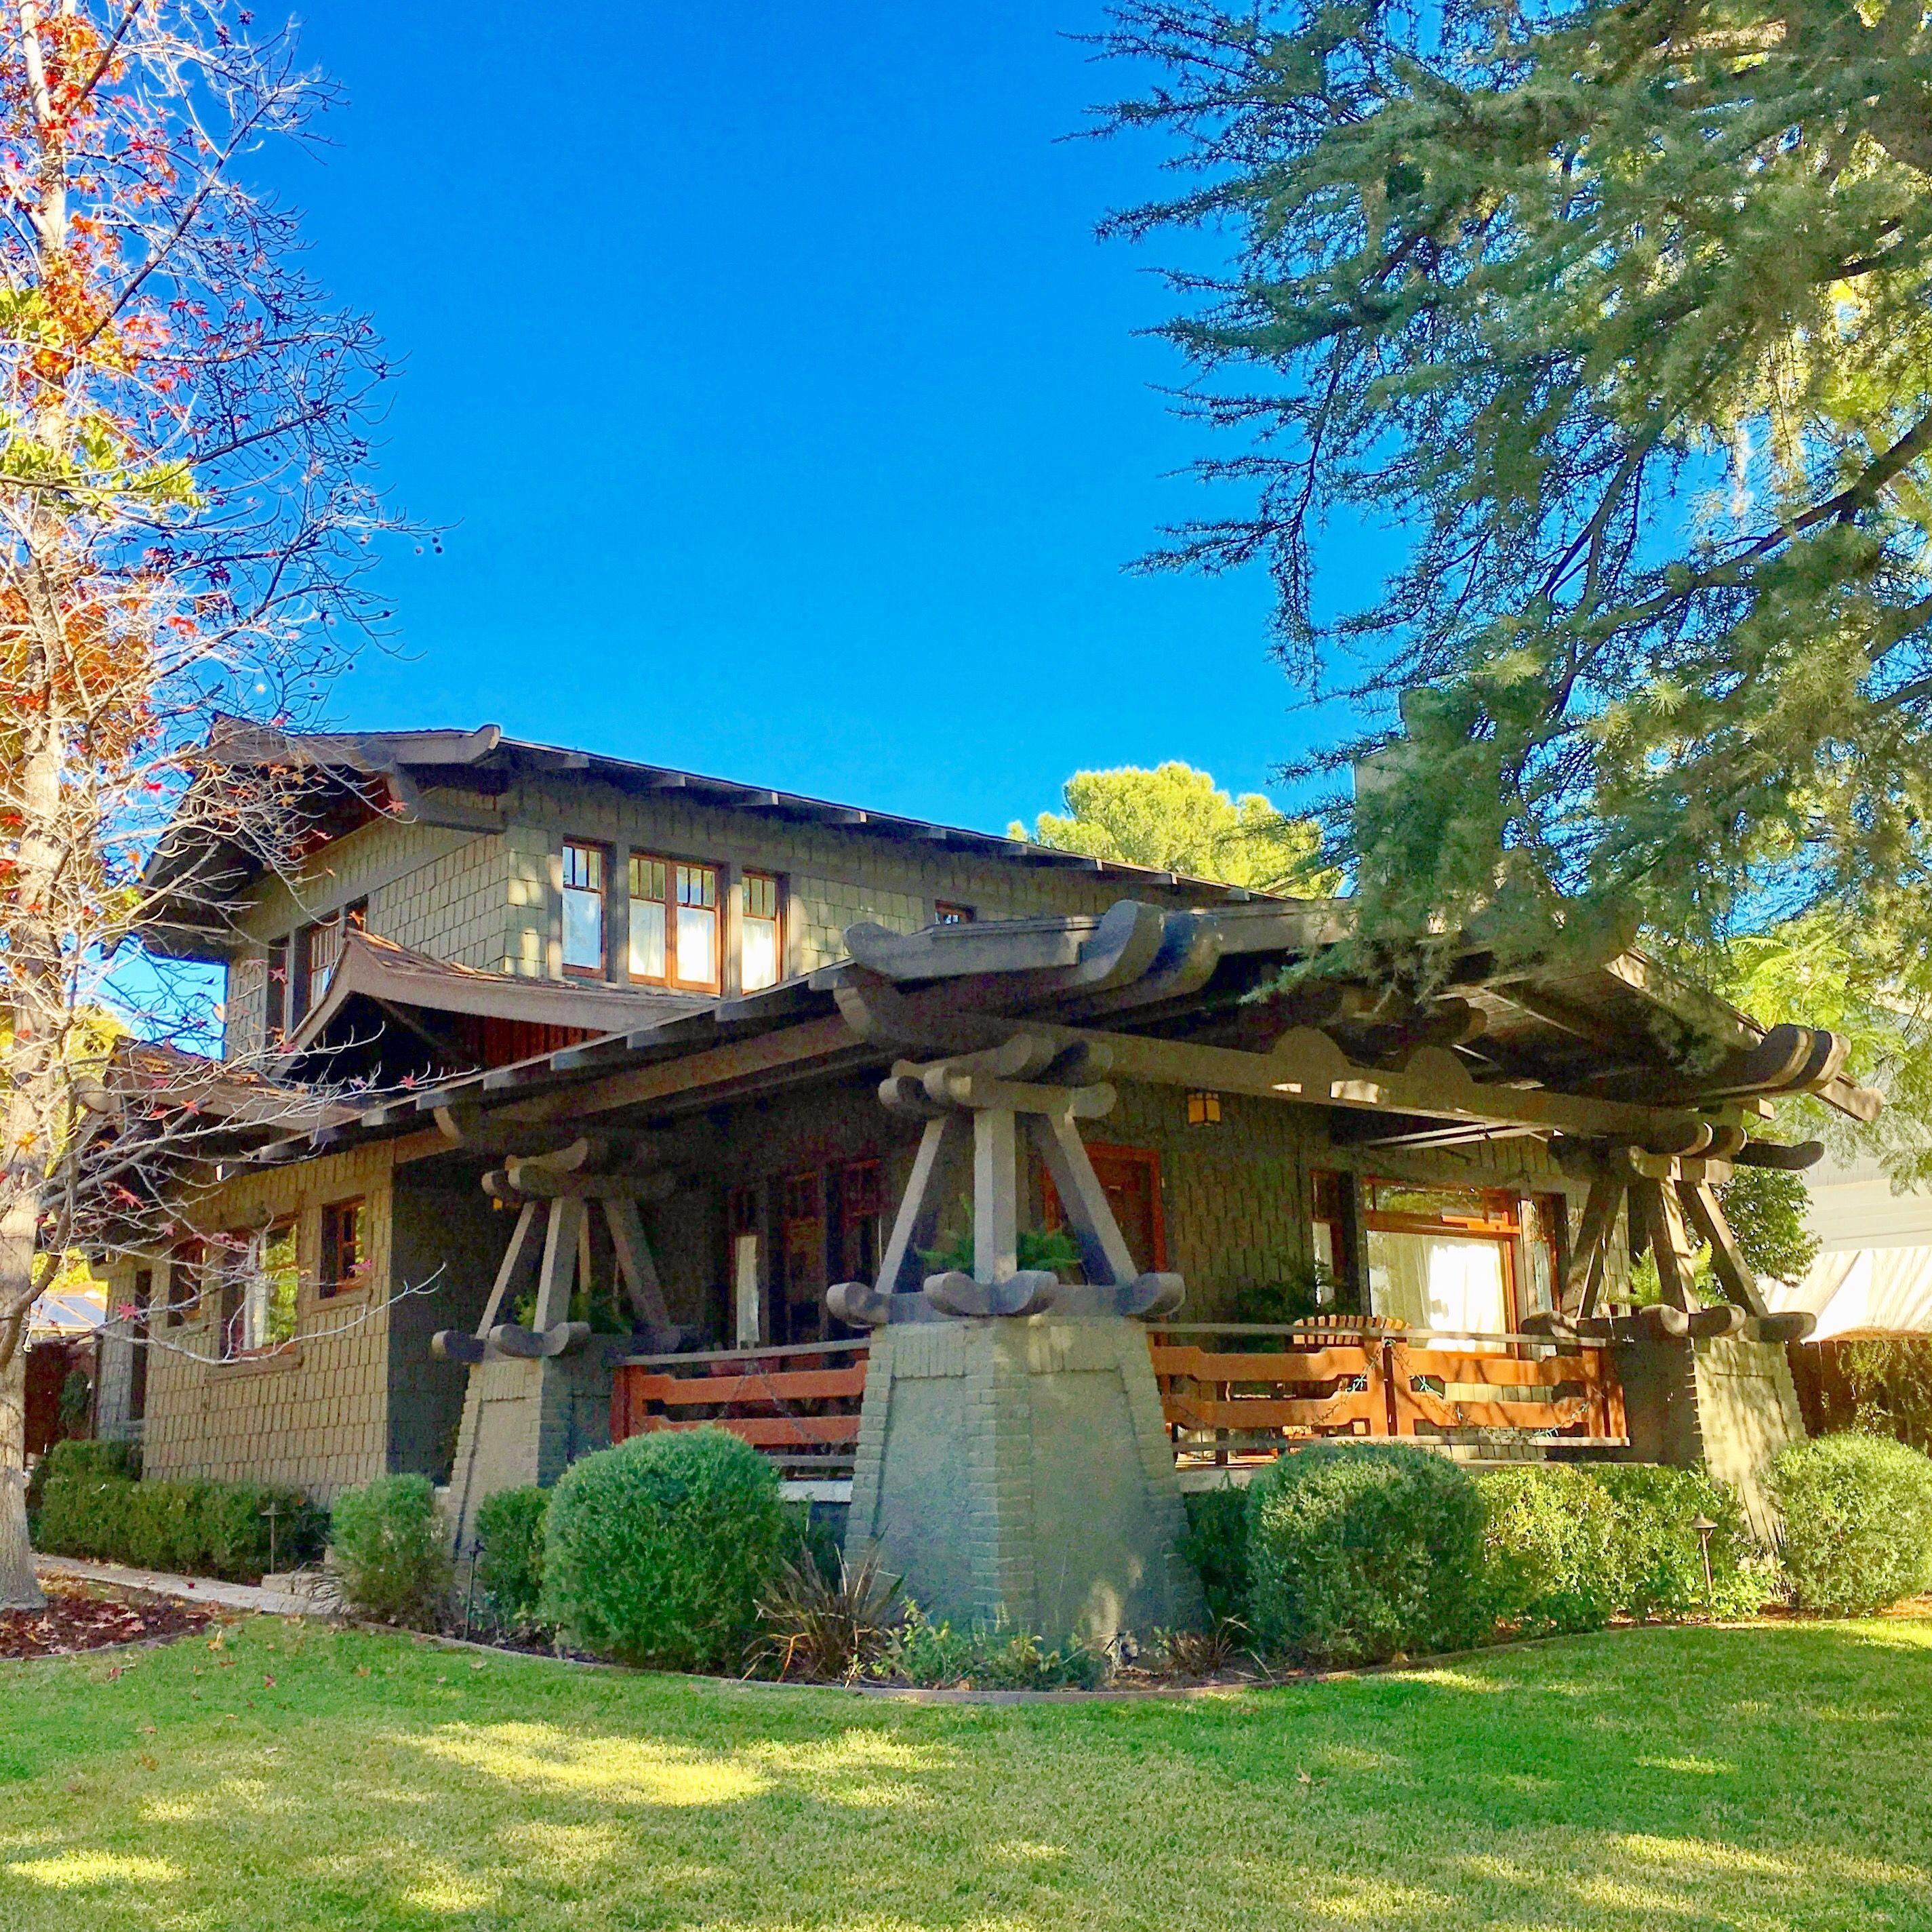 Arts And Crafts Home Pasadena California Home Decor Diy